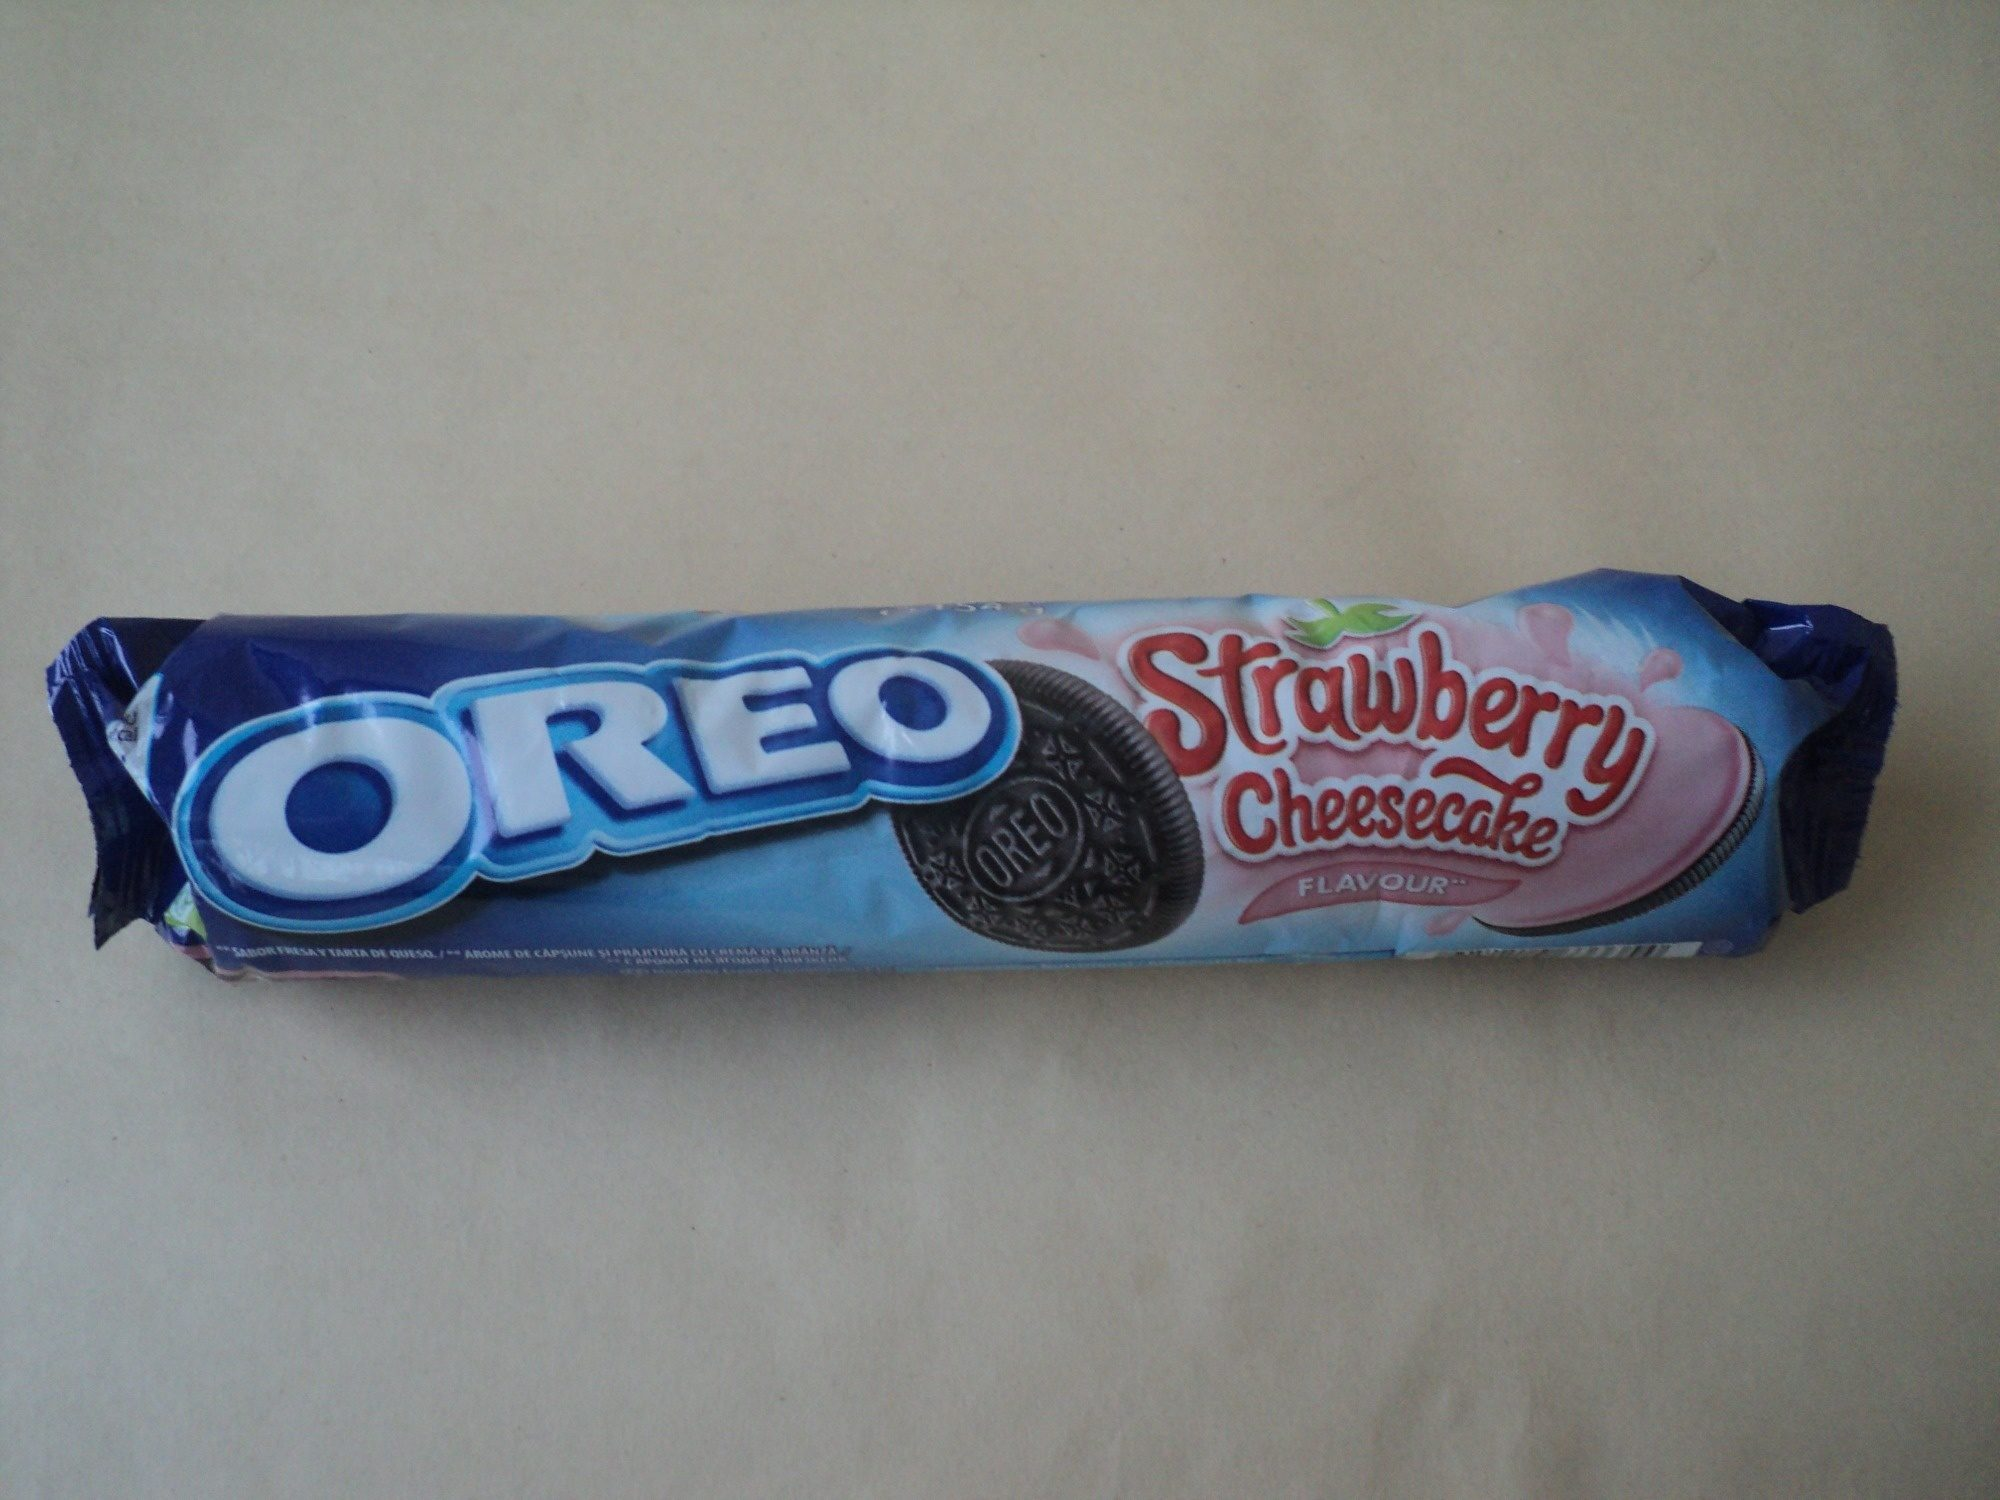 Oreo Strawberry Cheesecake 14er - Producto - ro